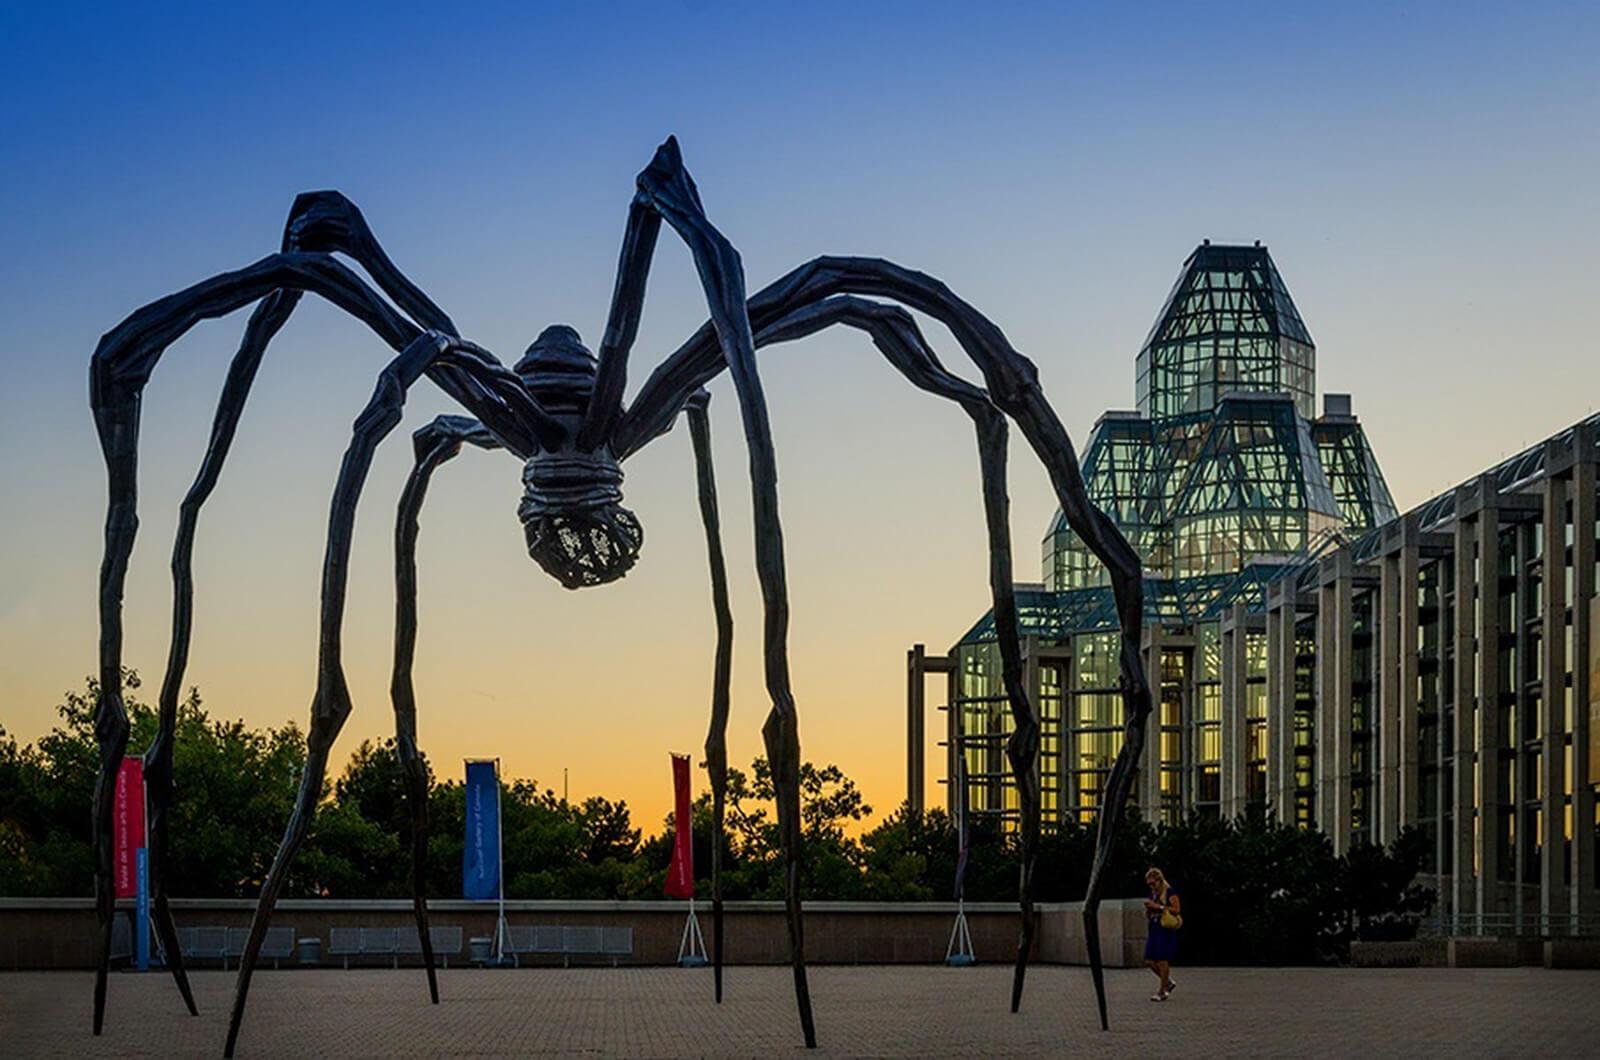 路易斯.布爾喬亞,《Maman》(Spider Sculpture),1999。圖/取自flickr。